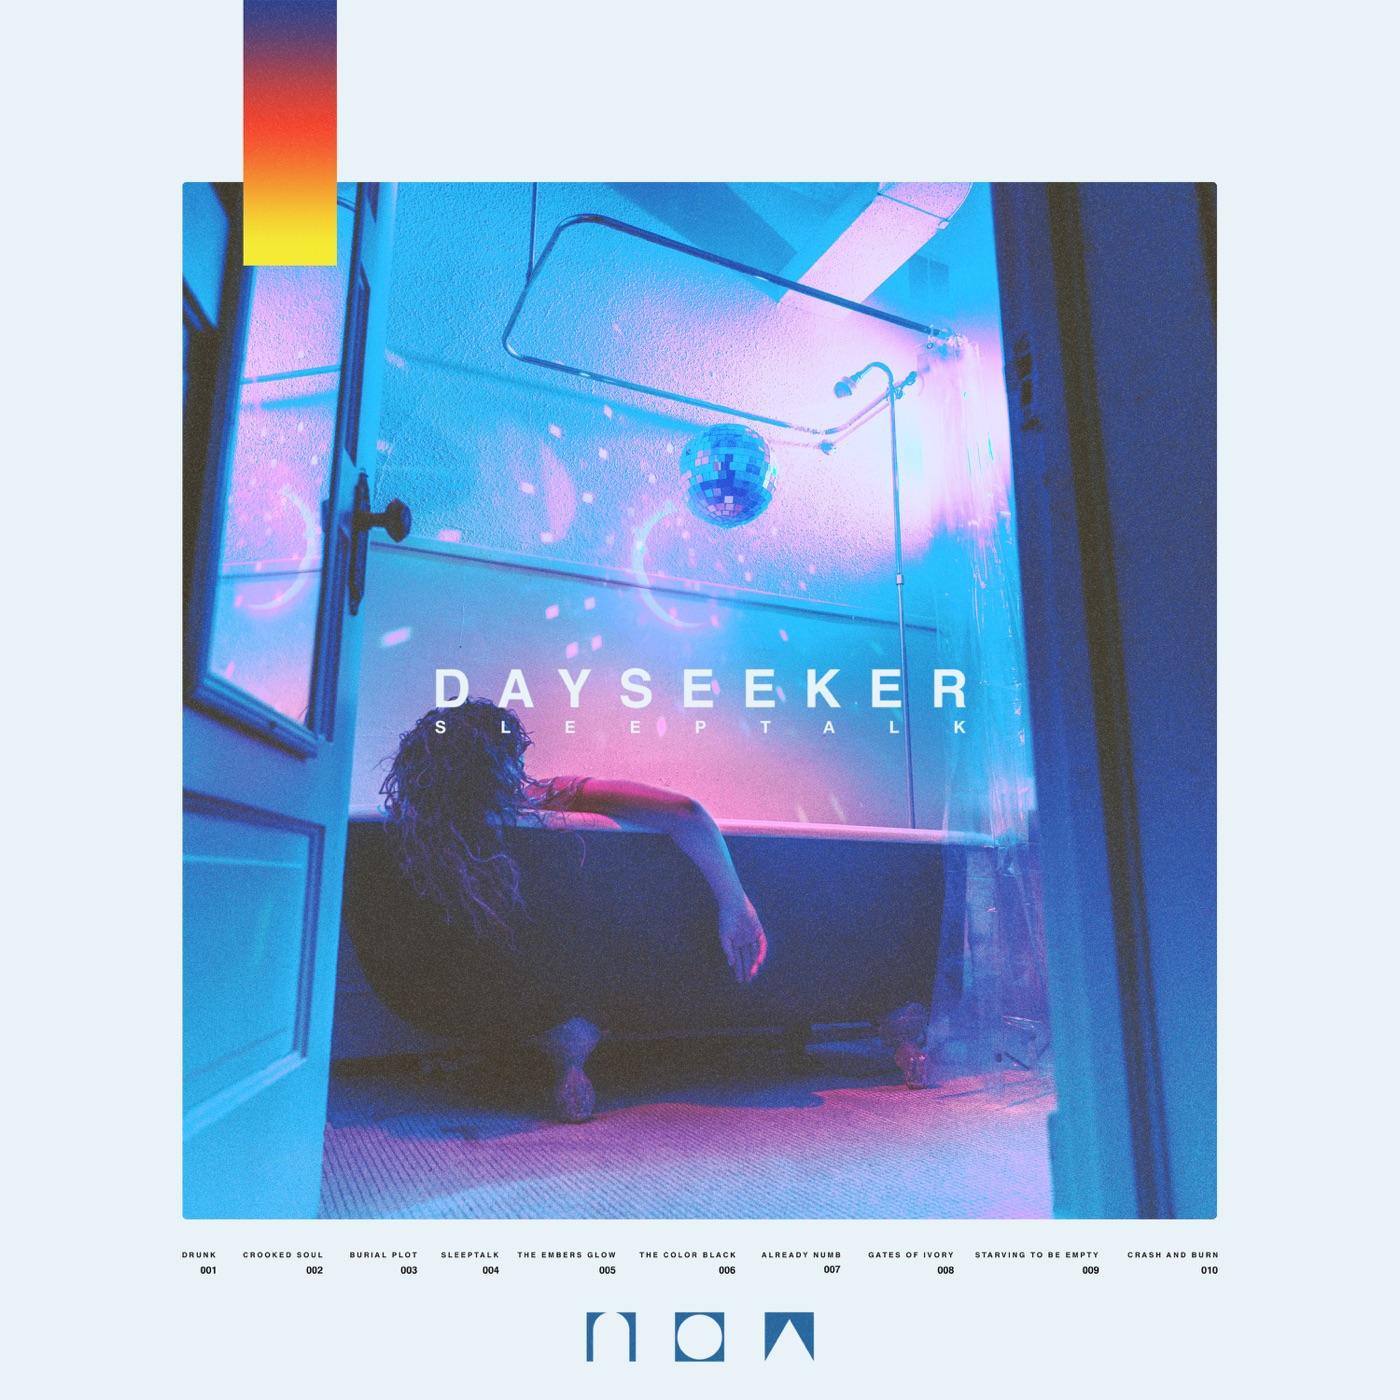 Dayseeker - Sleeptalk (2019)